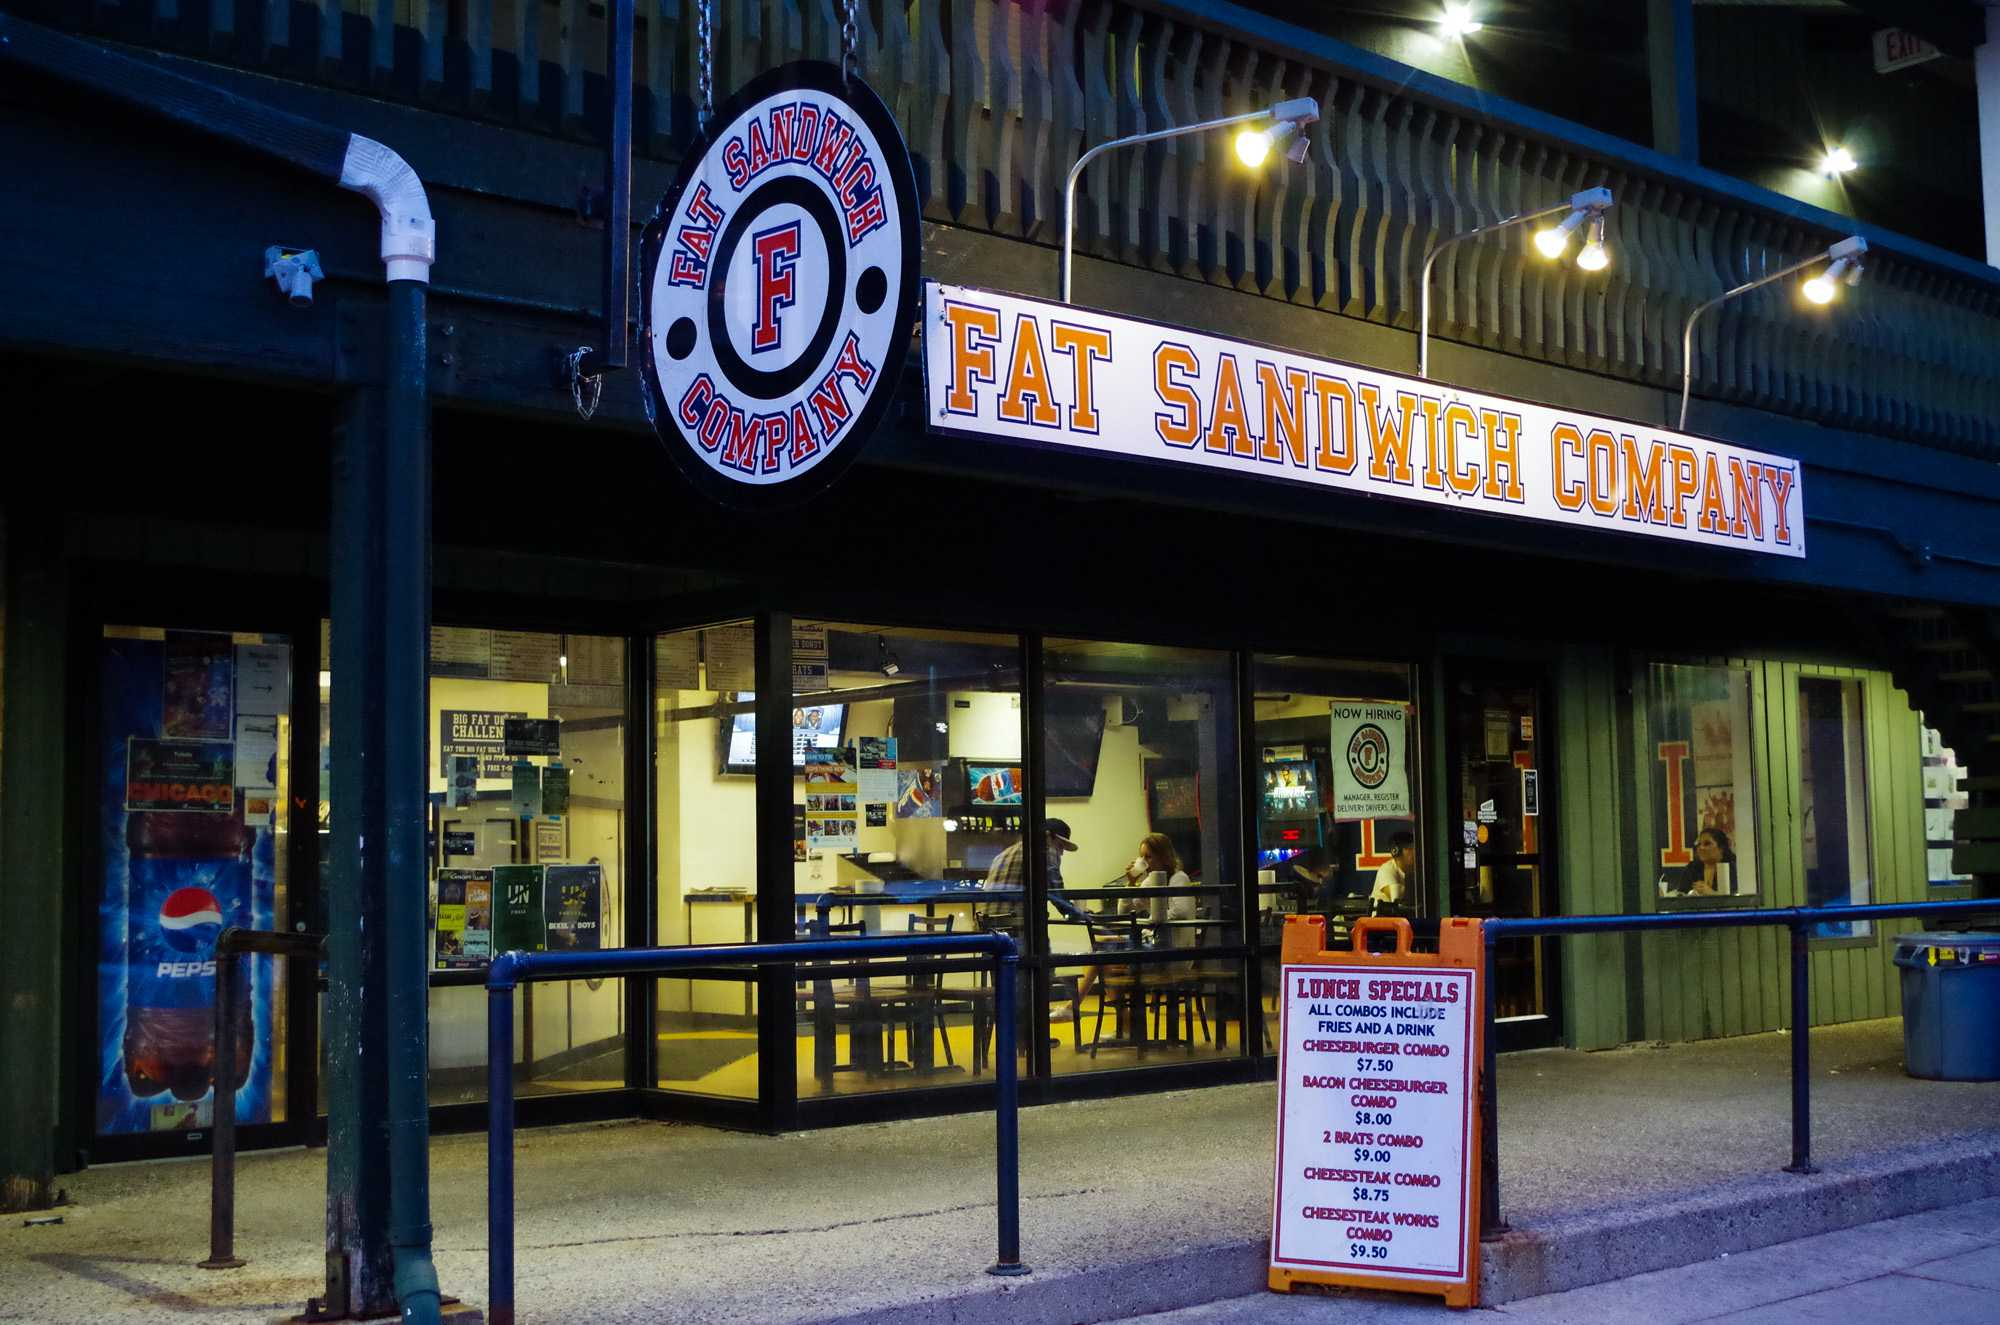 Front of Fat Sandwich on East John Street on Sunday, Feb 28, 2016.